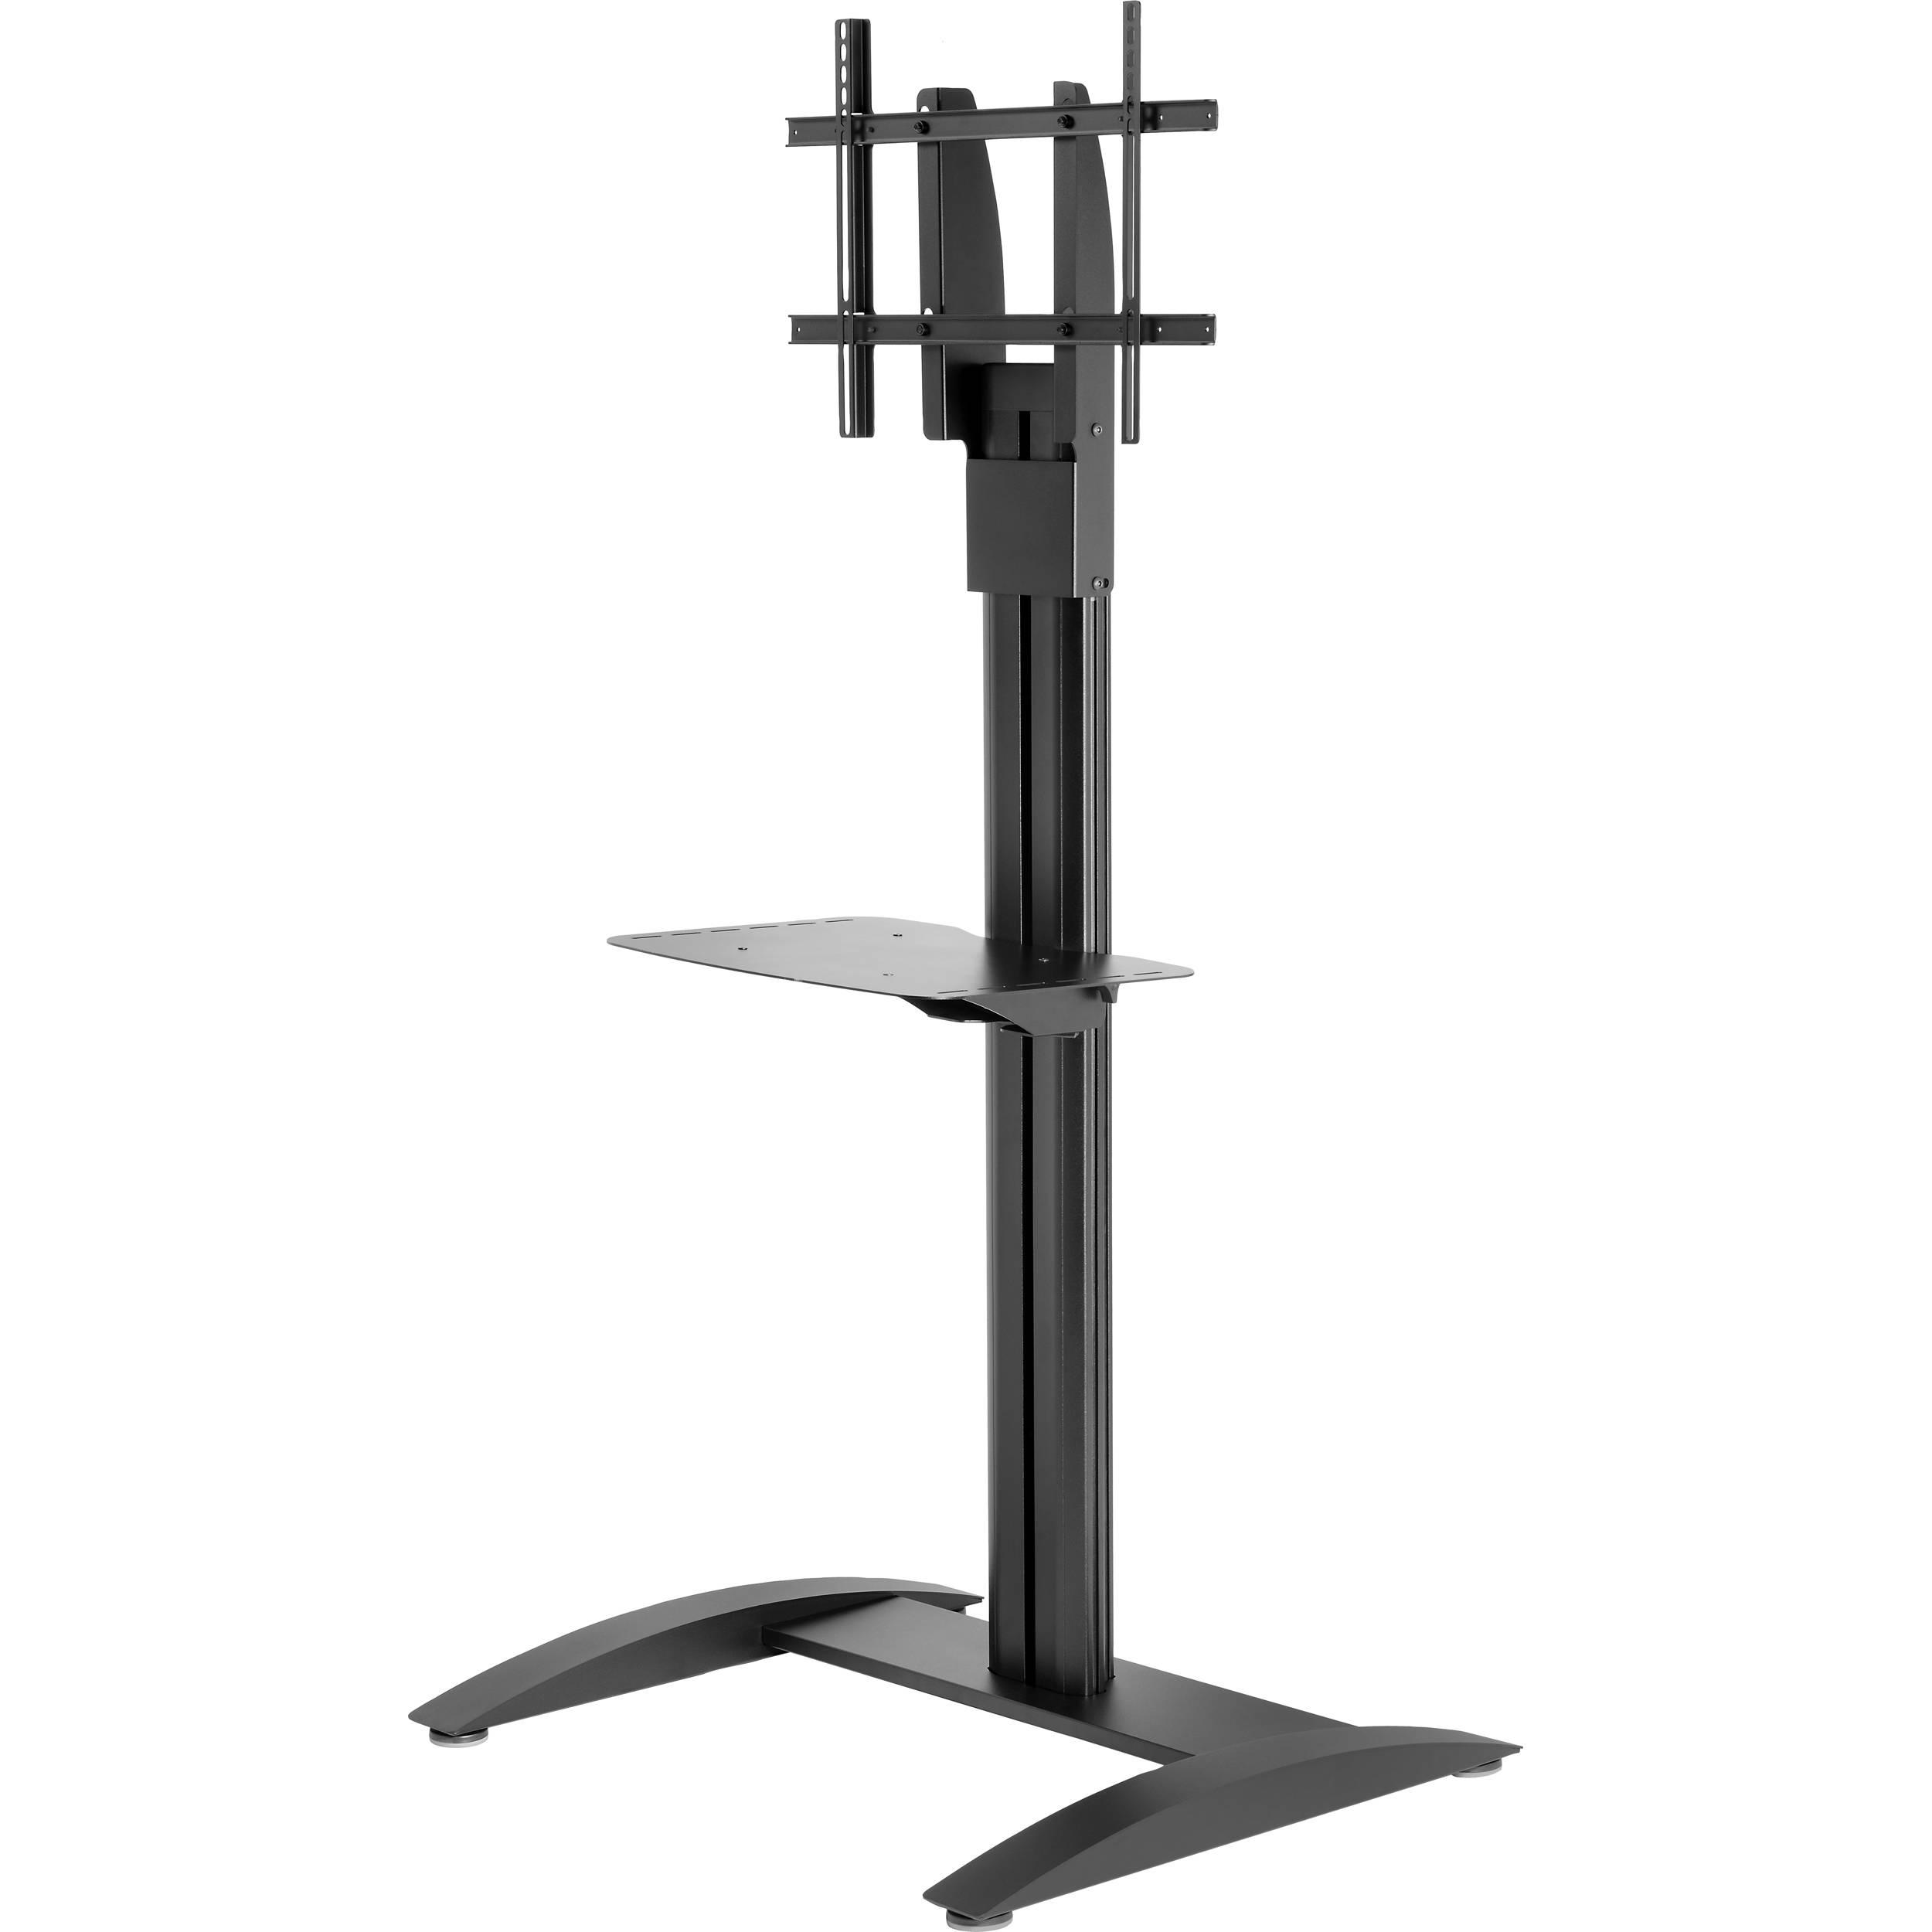 Peerless Av Smartmount Flat Panel Floor Stand Ss560m New B Amp H